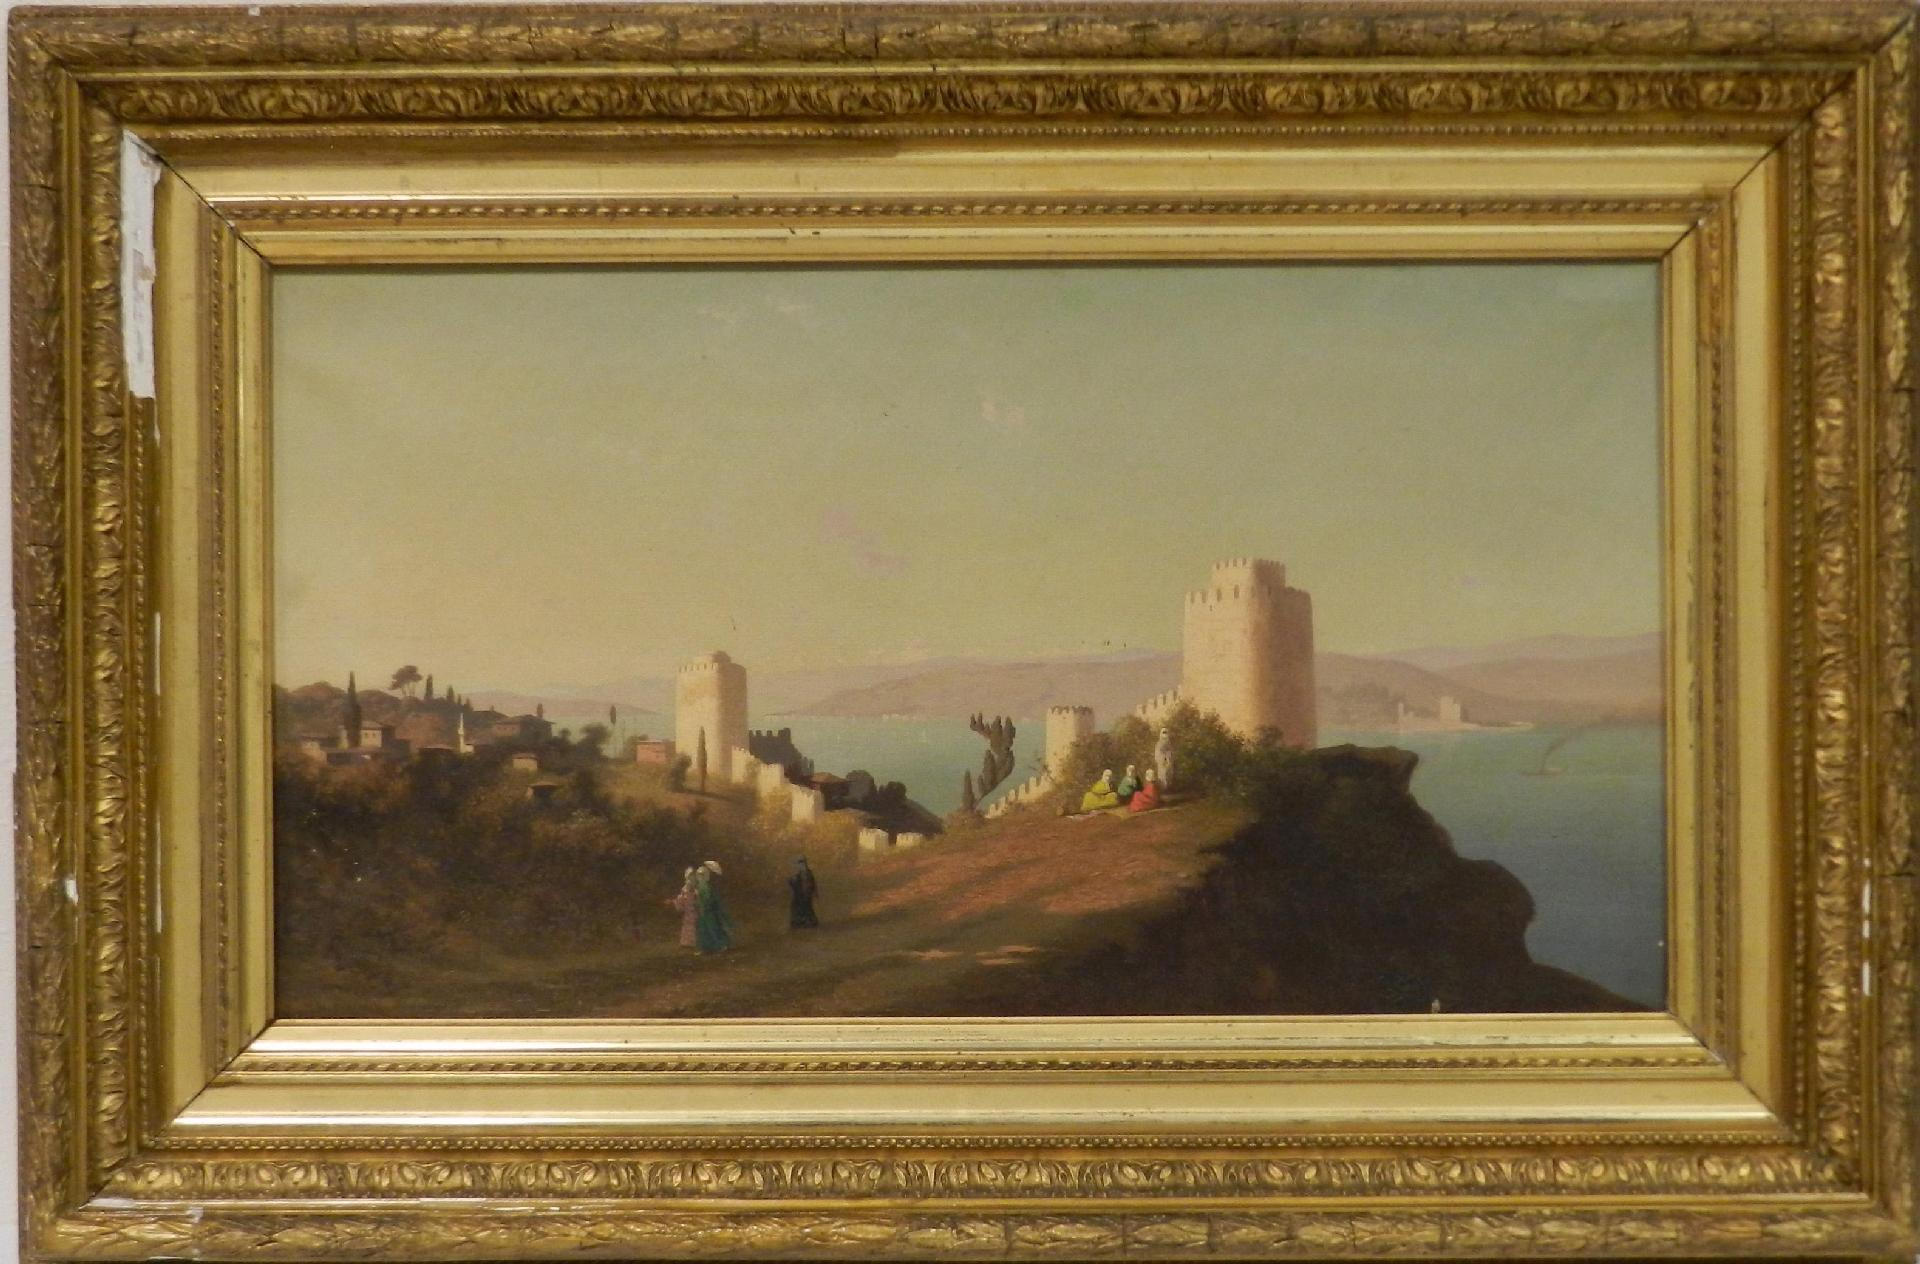 Rumeli-Hisar fortress